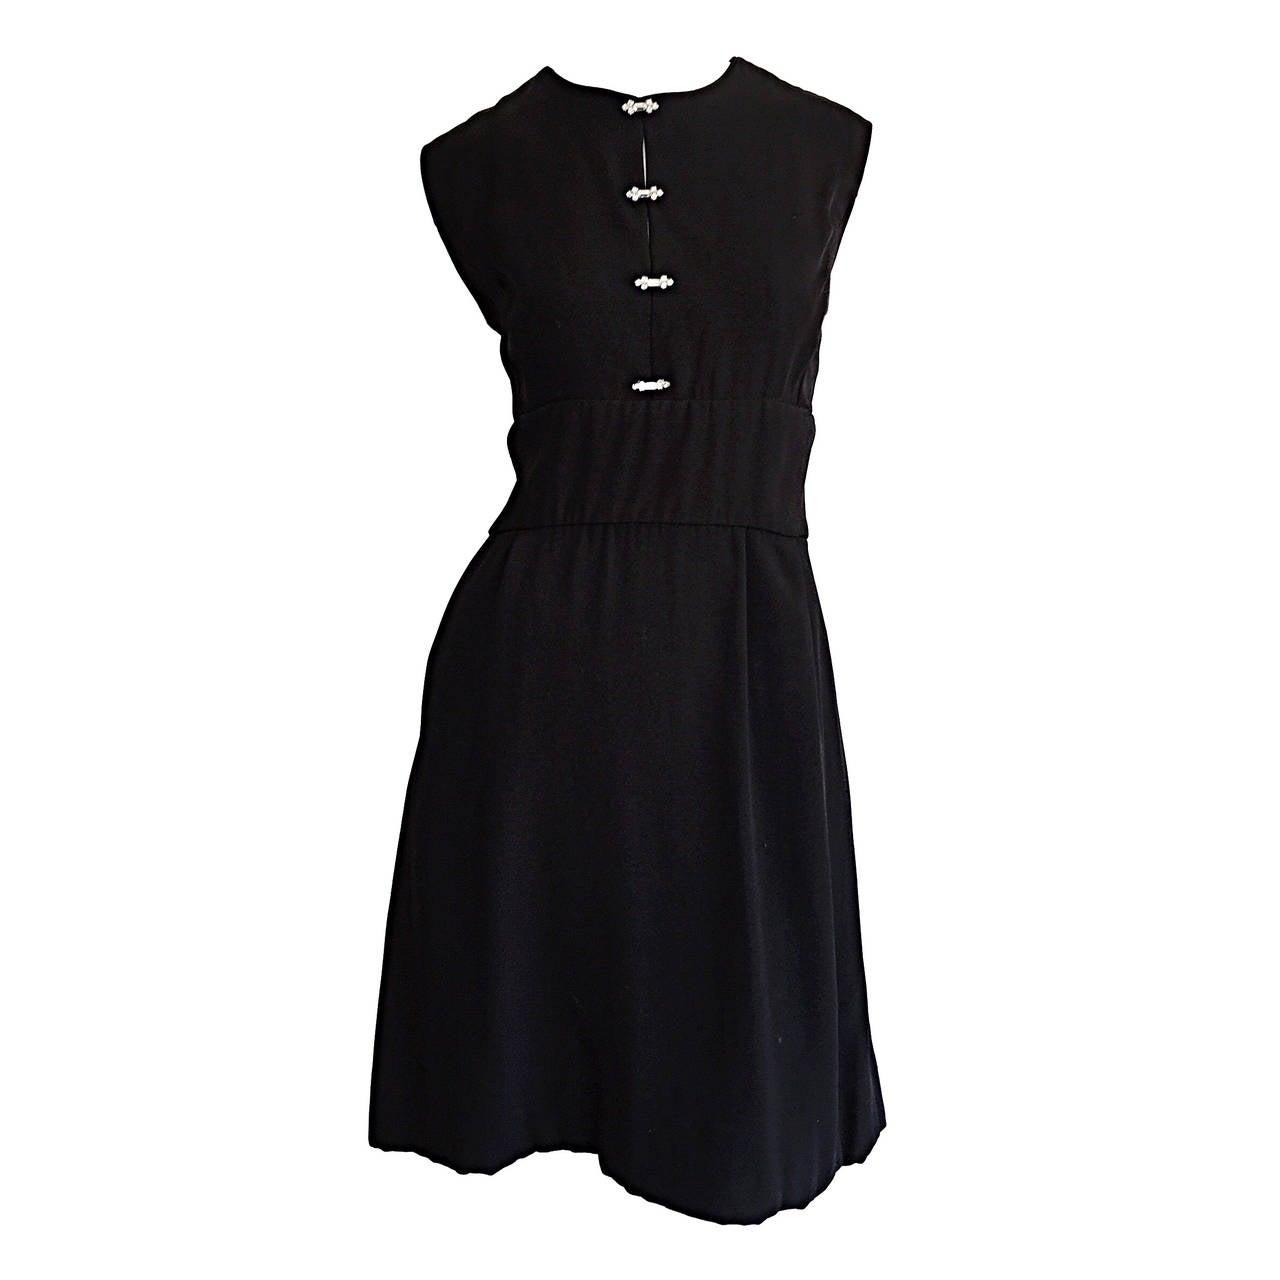 Black dress vintage - 1960s Ceil Chapman Vintage Little Black Dress W Rhinestones 1